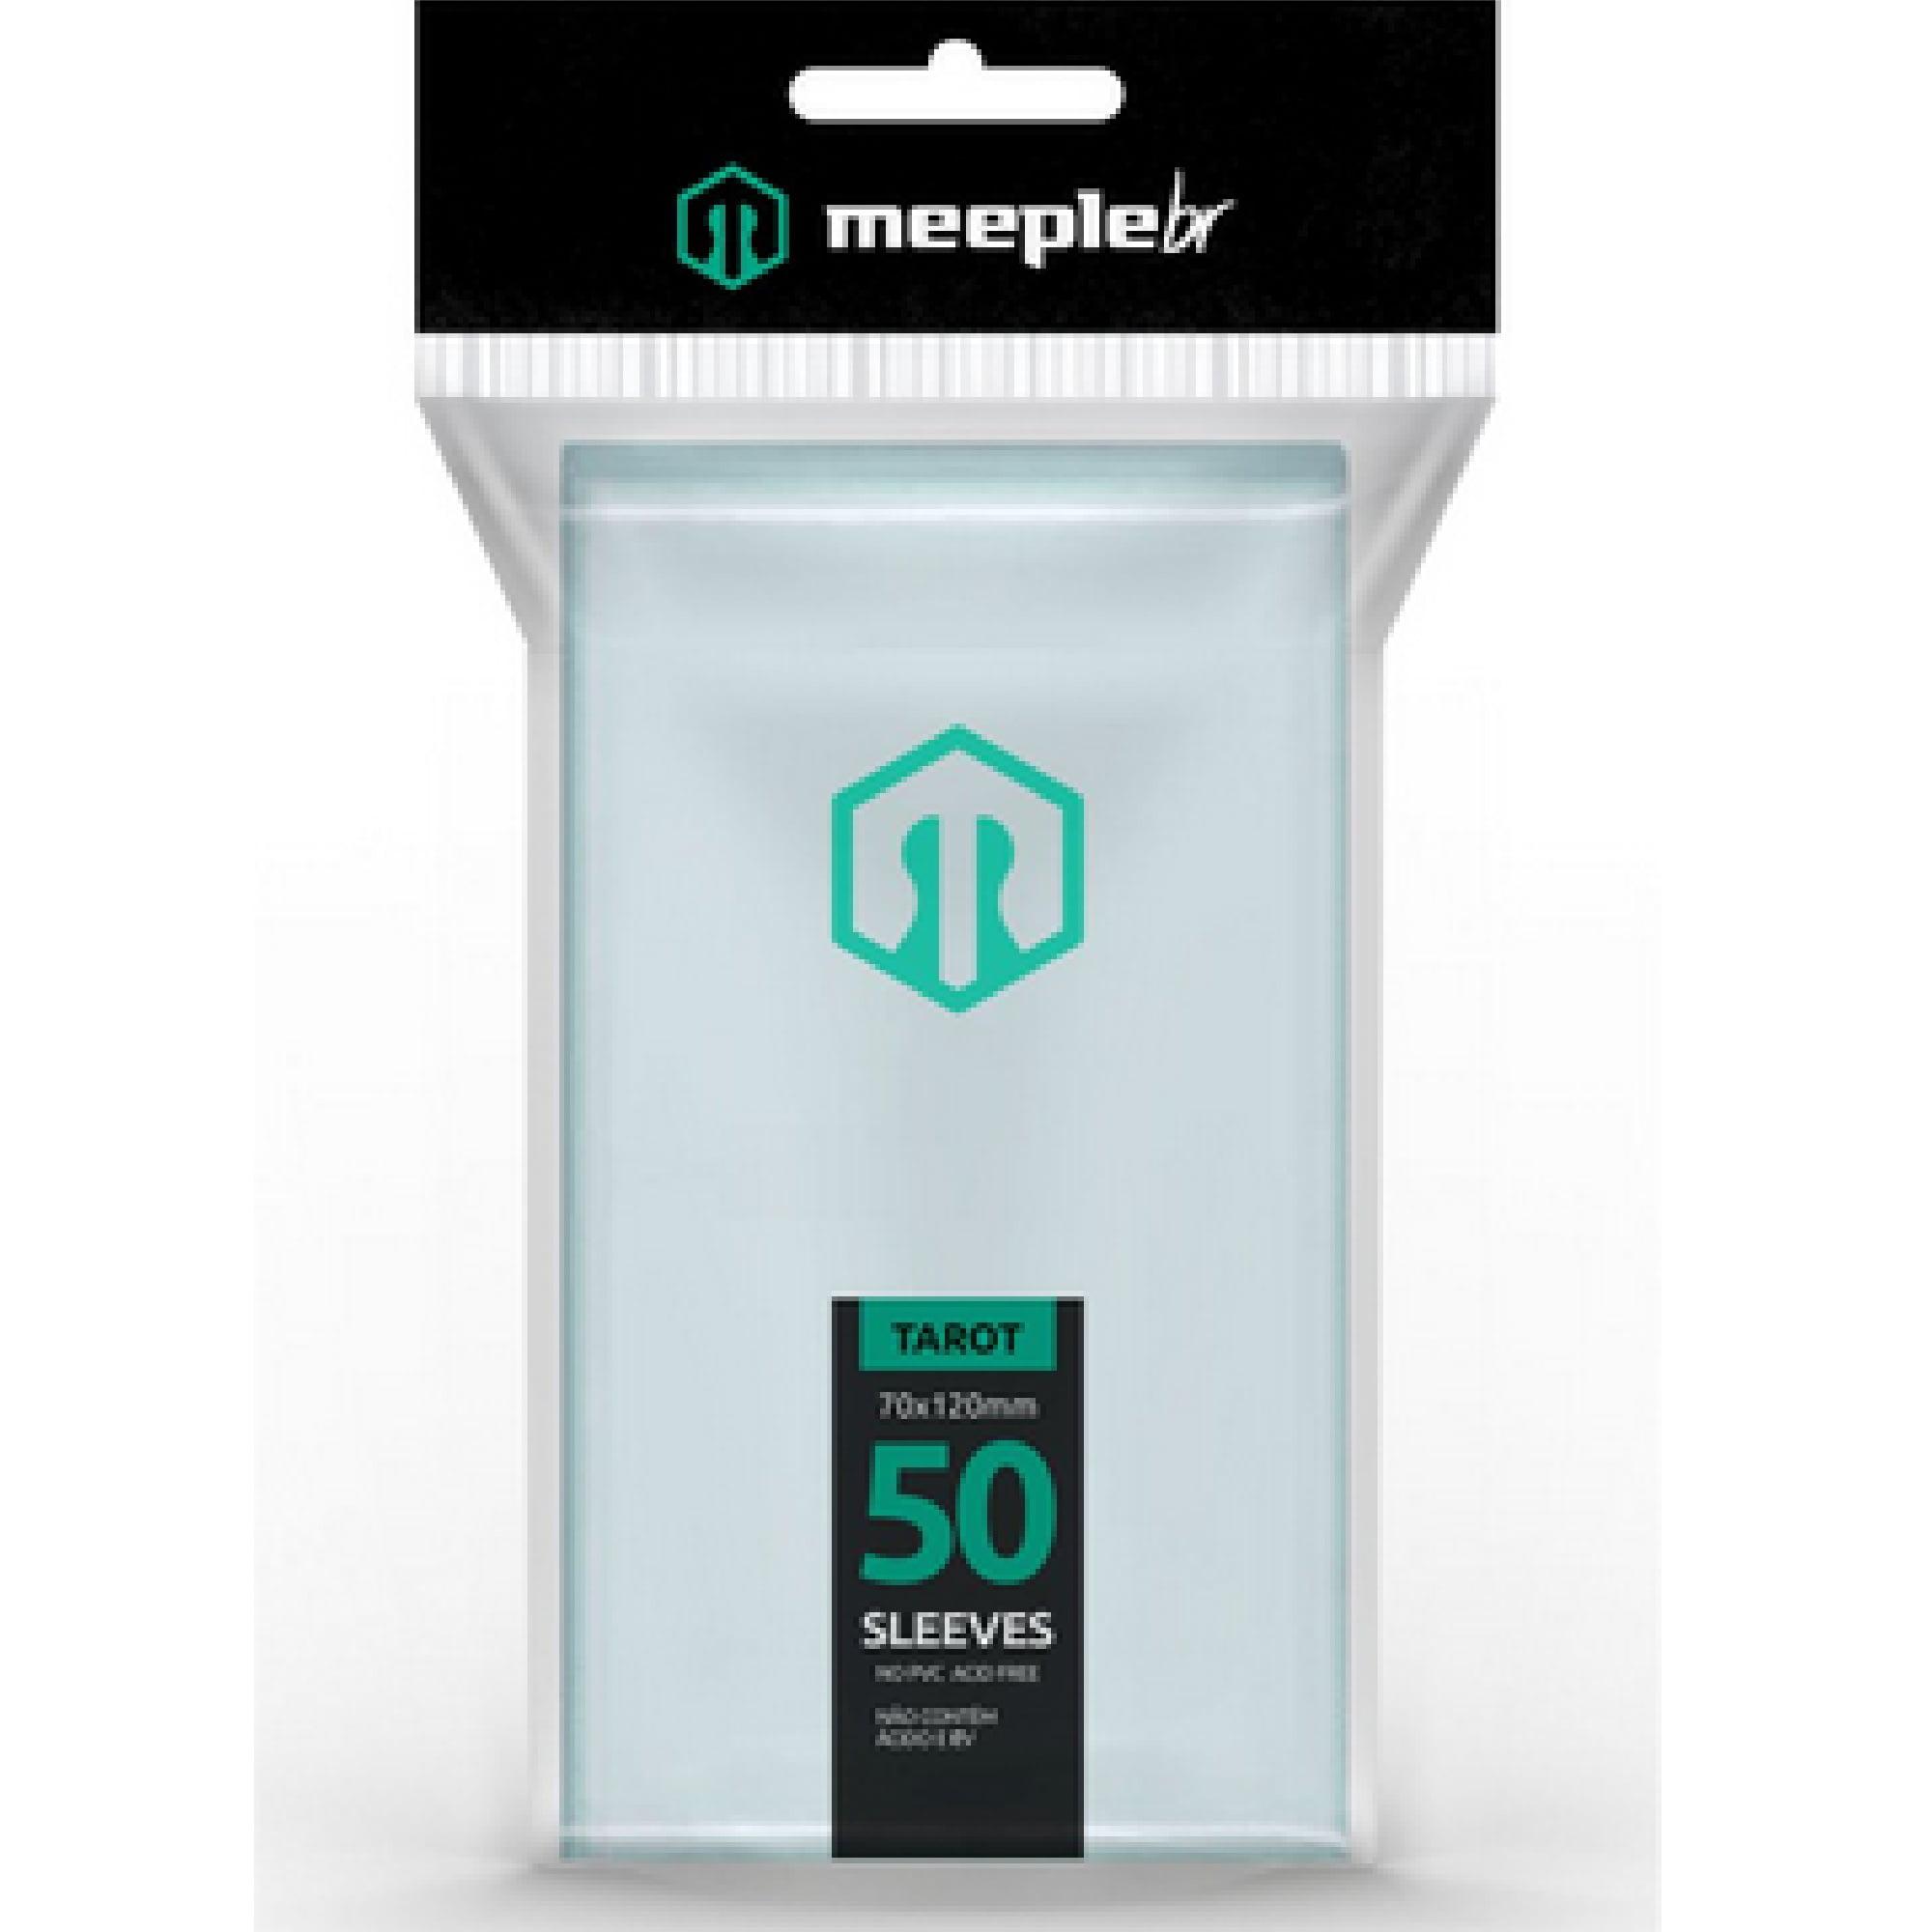 Sleeves Tarot (70 x 120mm) MeepleBR